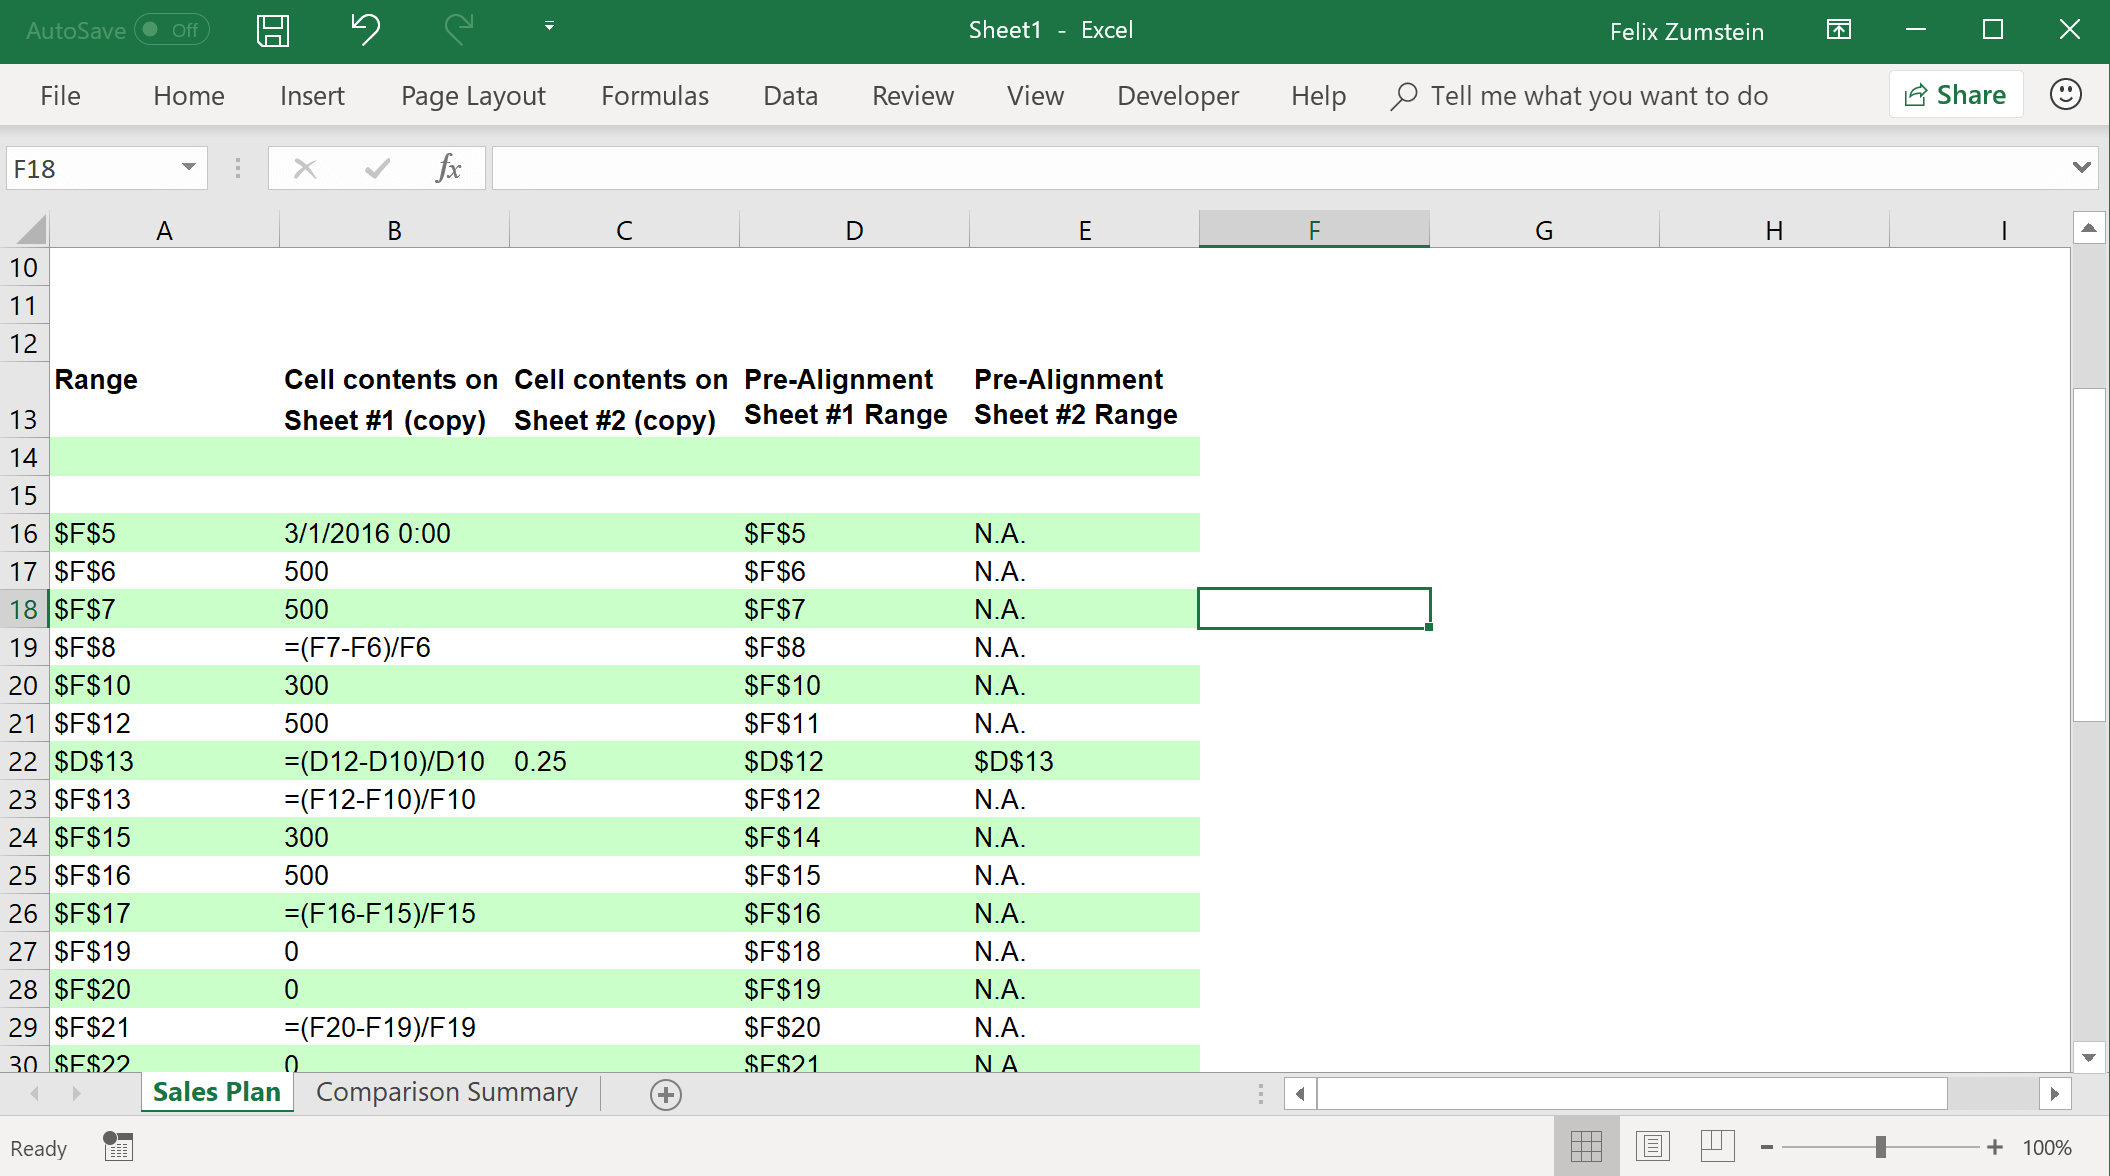 DiffEngineX Report